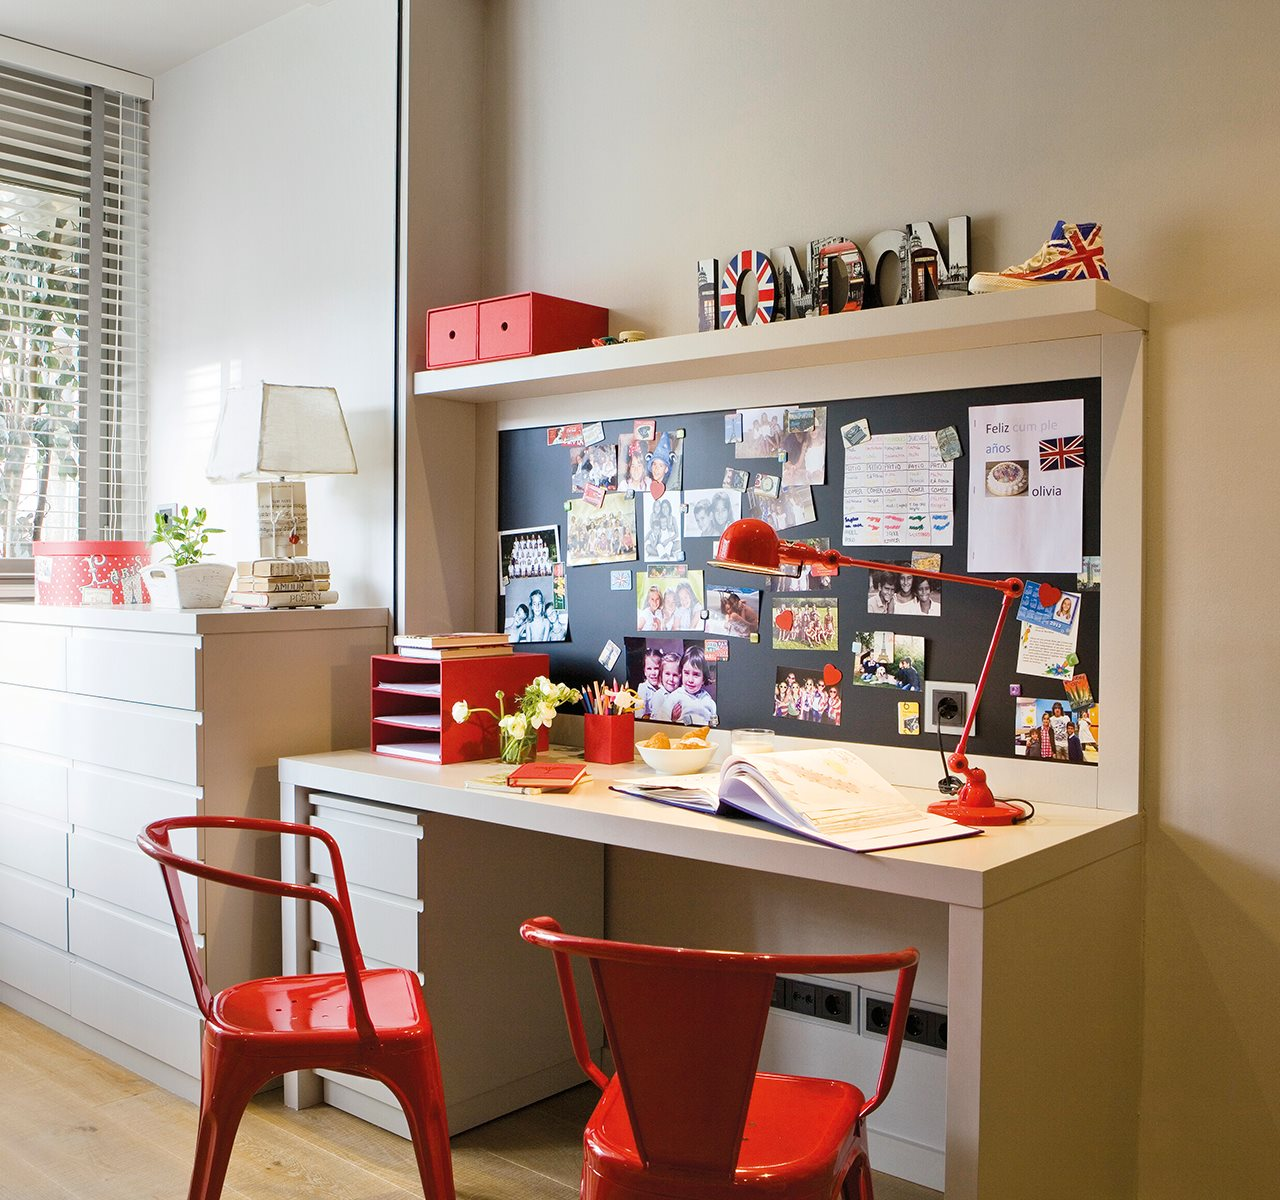 15 estudios no aburridos - Ideas para decorar un estudio ...